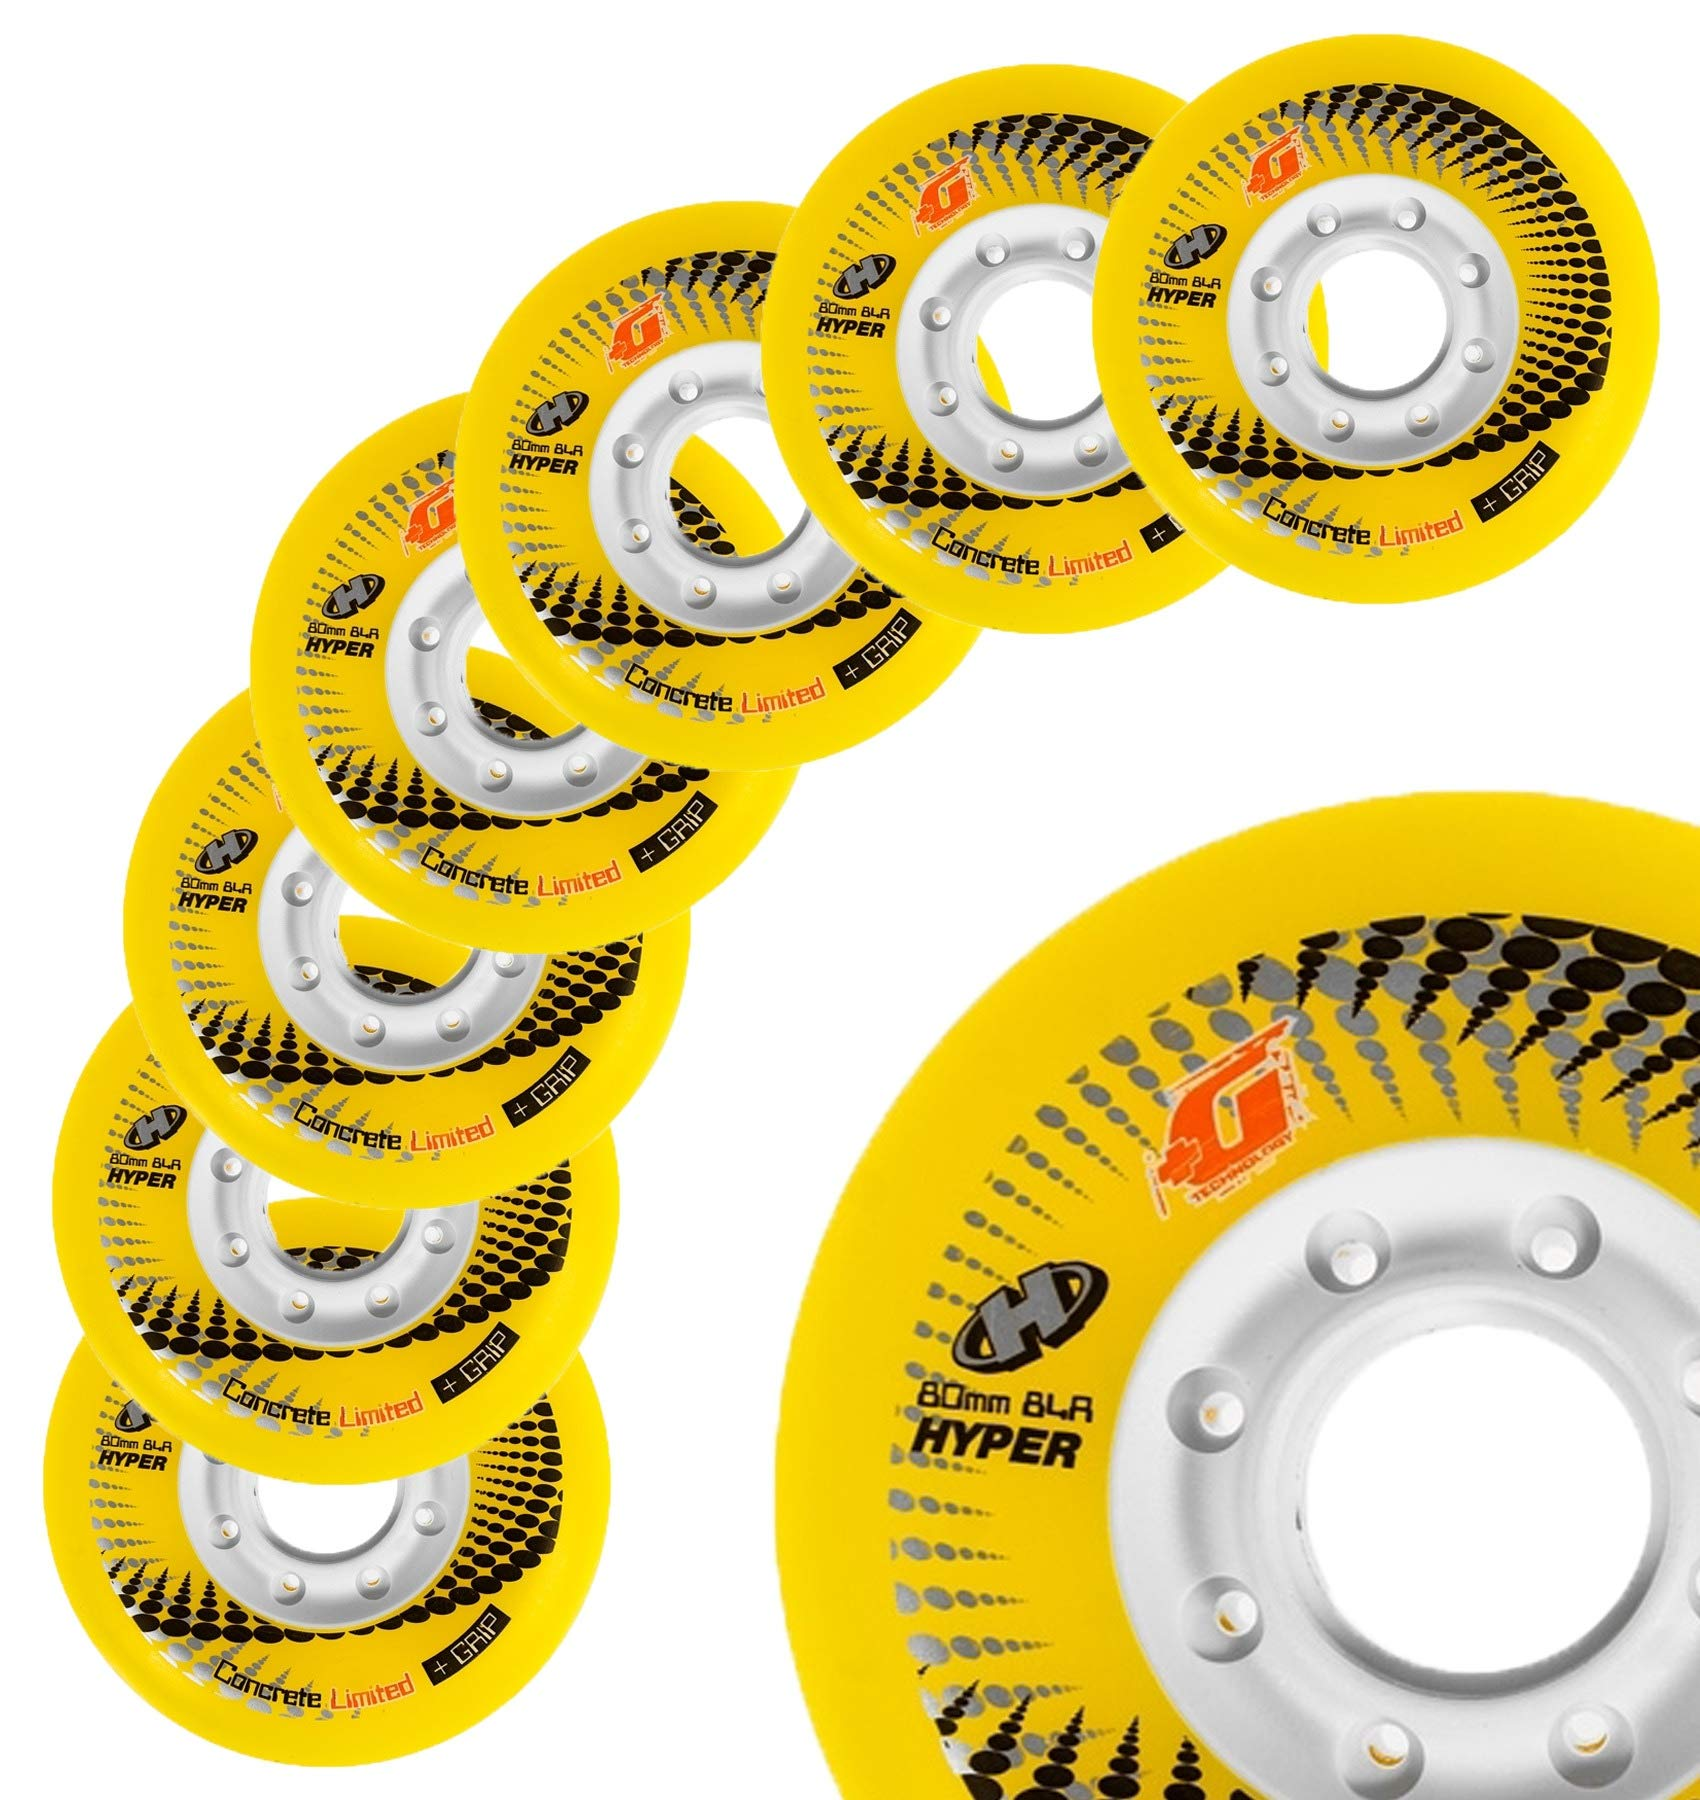 Inline Skate Wheels Hyper Concrete +G - 8 Wheels - 84A - Sizes: 72MM, 76MM, 80MM - Freeride, Slalom, Fitness, Urban - Colors: White, Black, Orange, Green, Cyan, Red (Yellow, 80MM) by Hyper Wheels